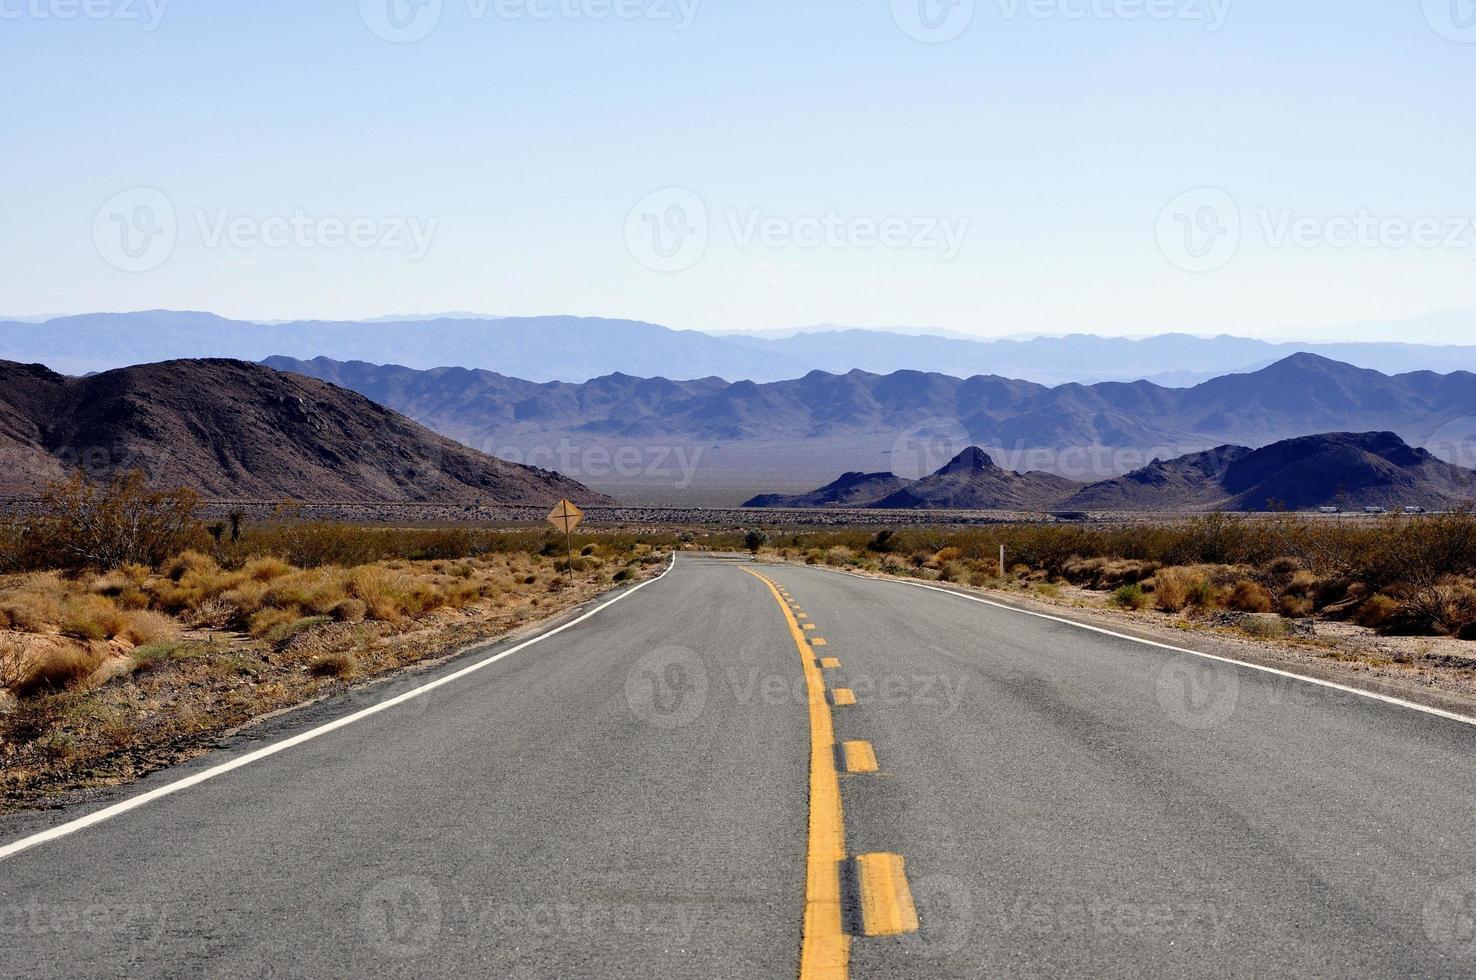 strada dolce di Las Vegas foto